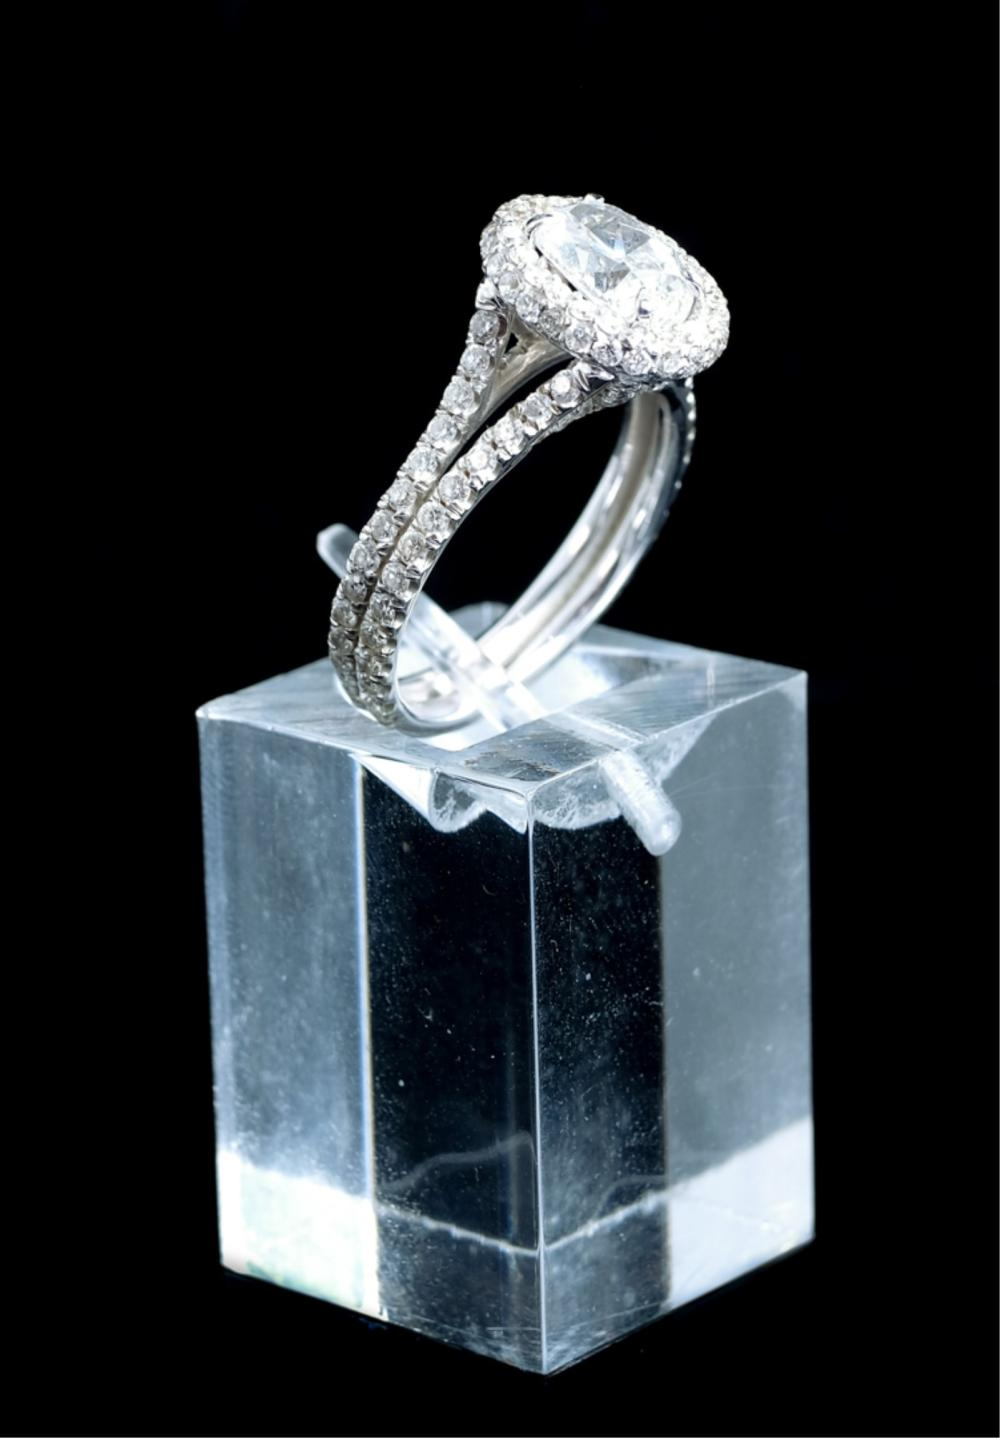 14k White Gold Diamond Ring, Size 5 1/2